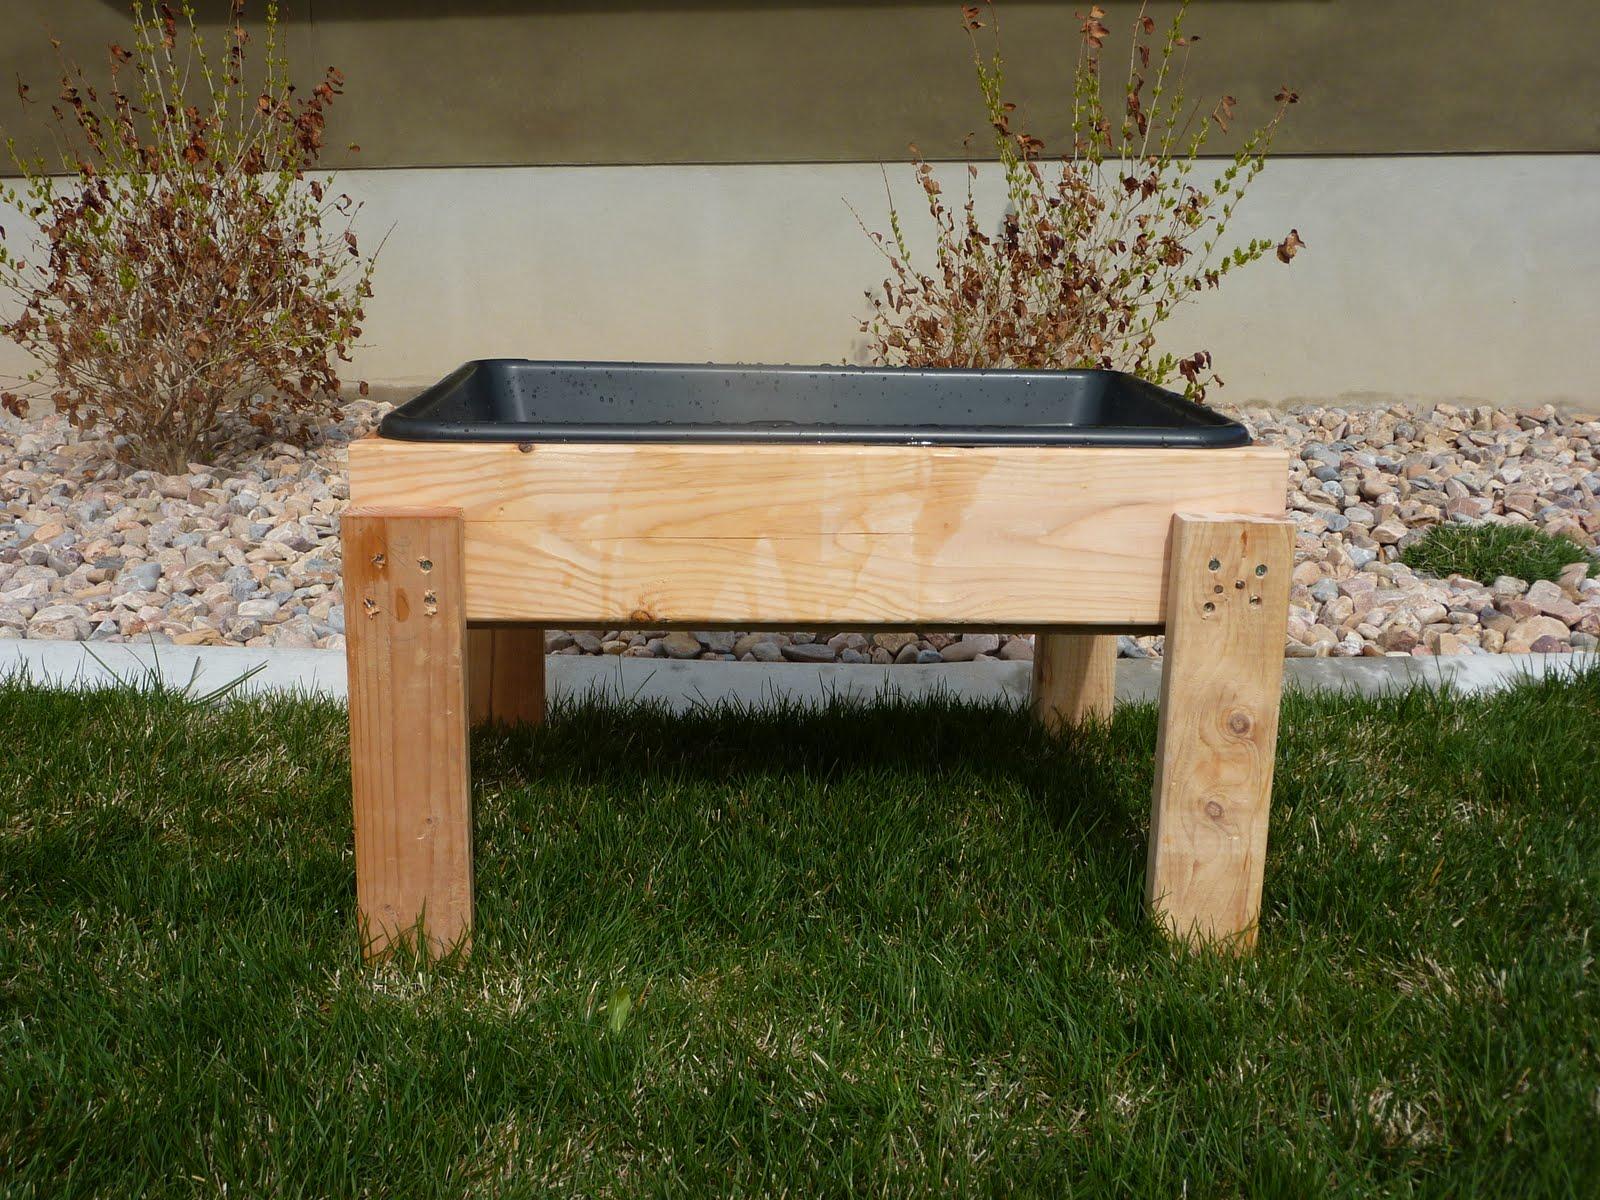 Step2 Arctic Splash Water Table (This Option Is Around $30.00)